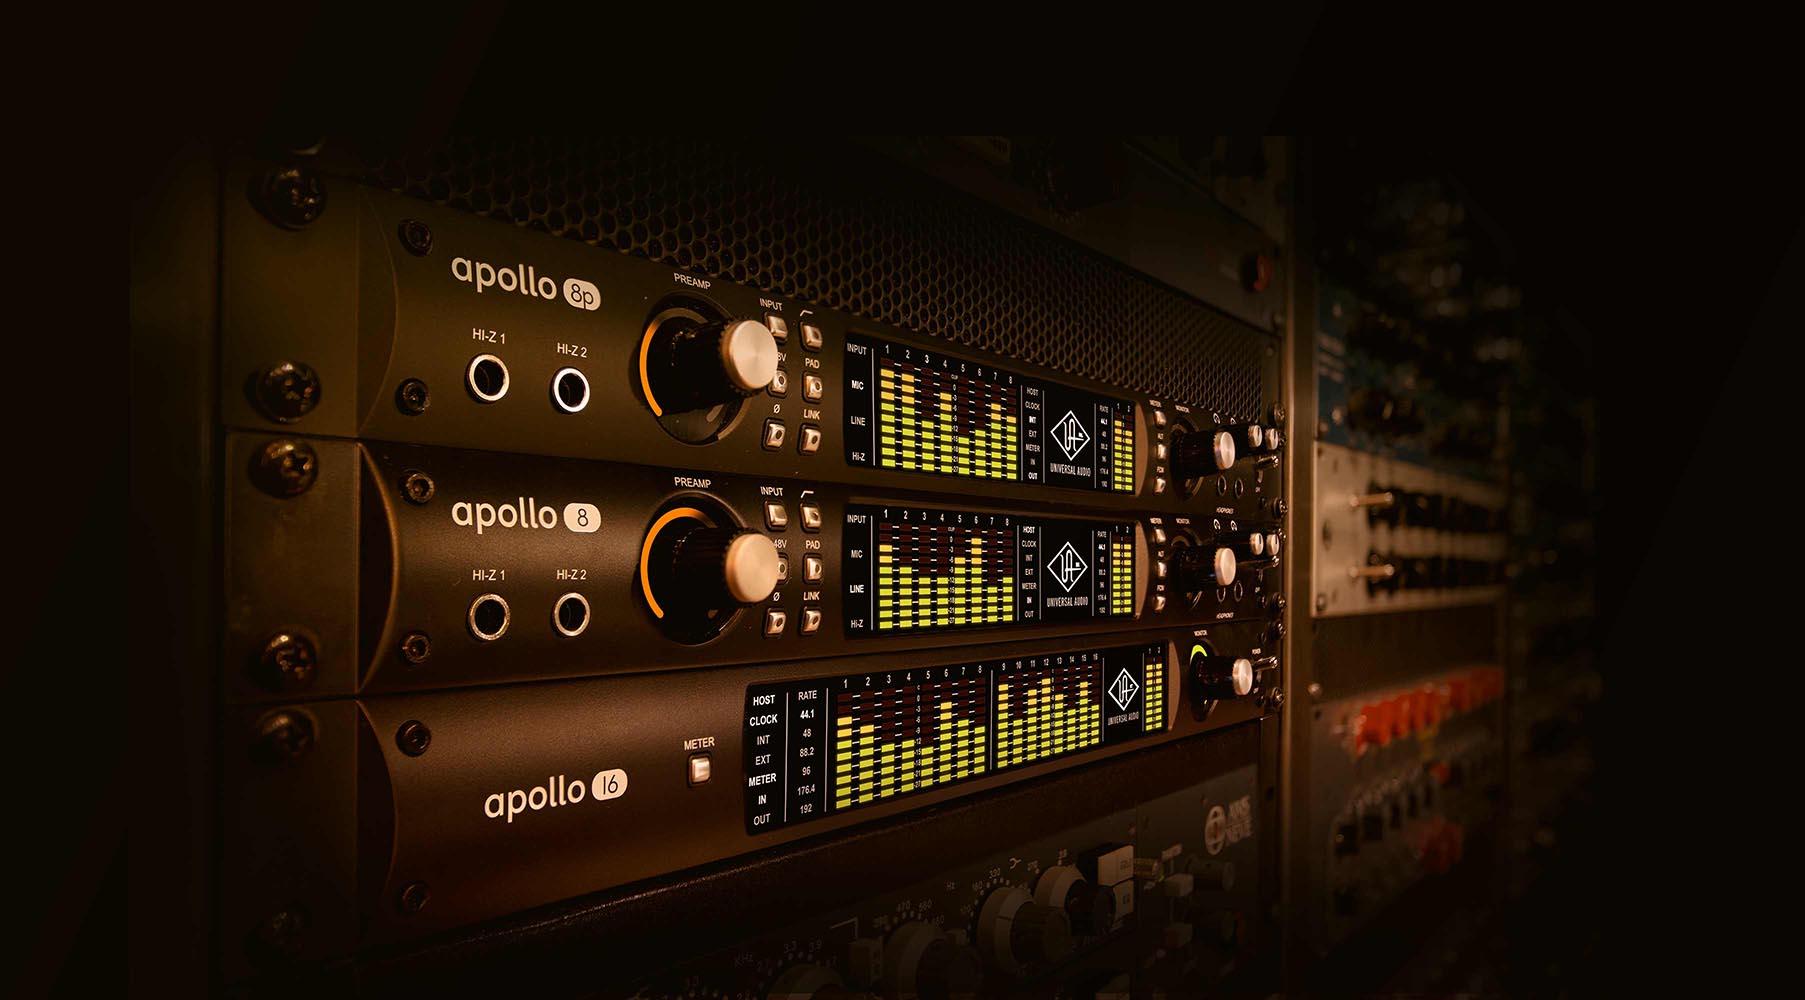 Live Wallpaper 3d Pictures Universal Audio Audio Interfaces Uad Plug Ins